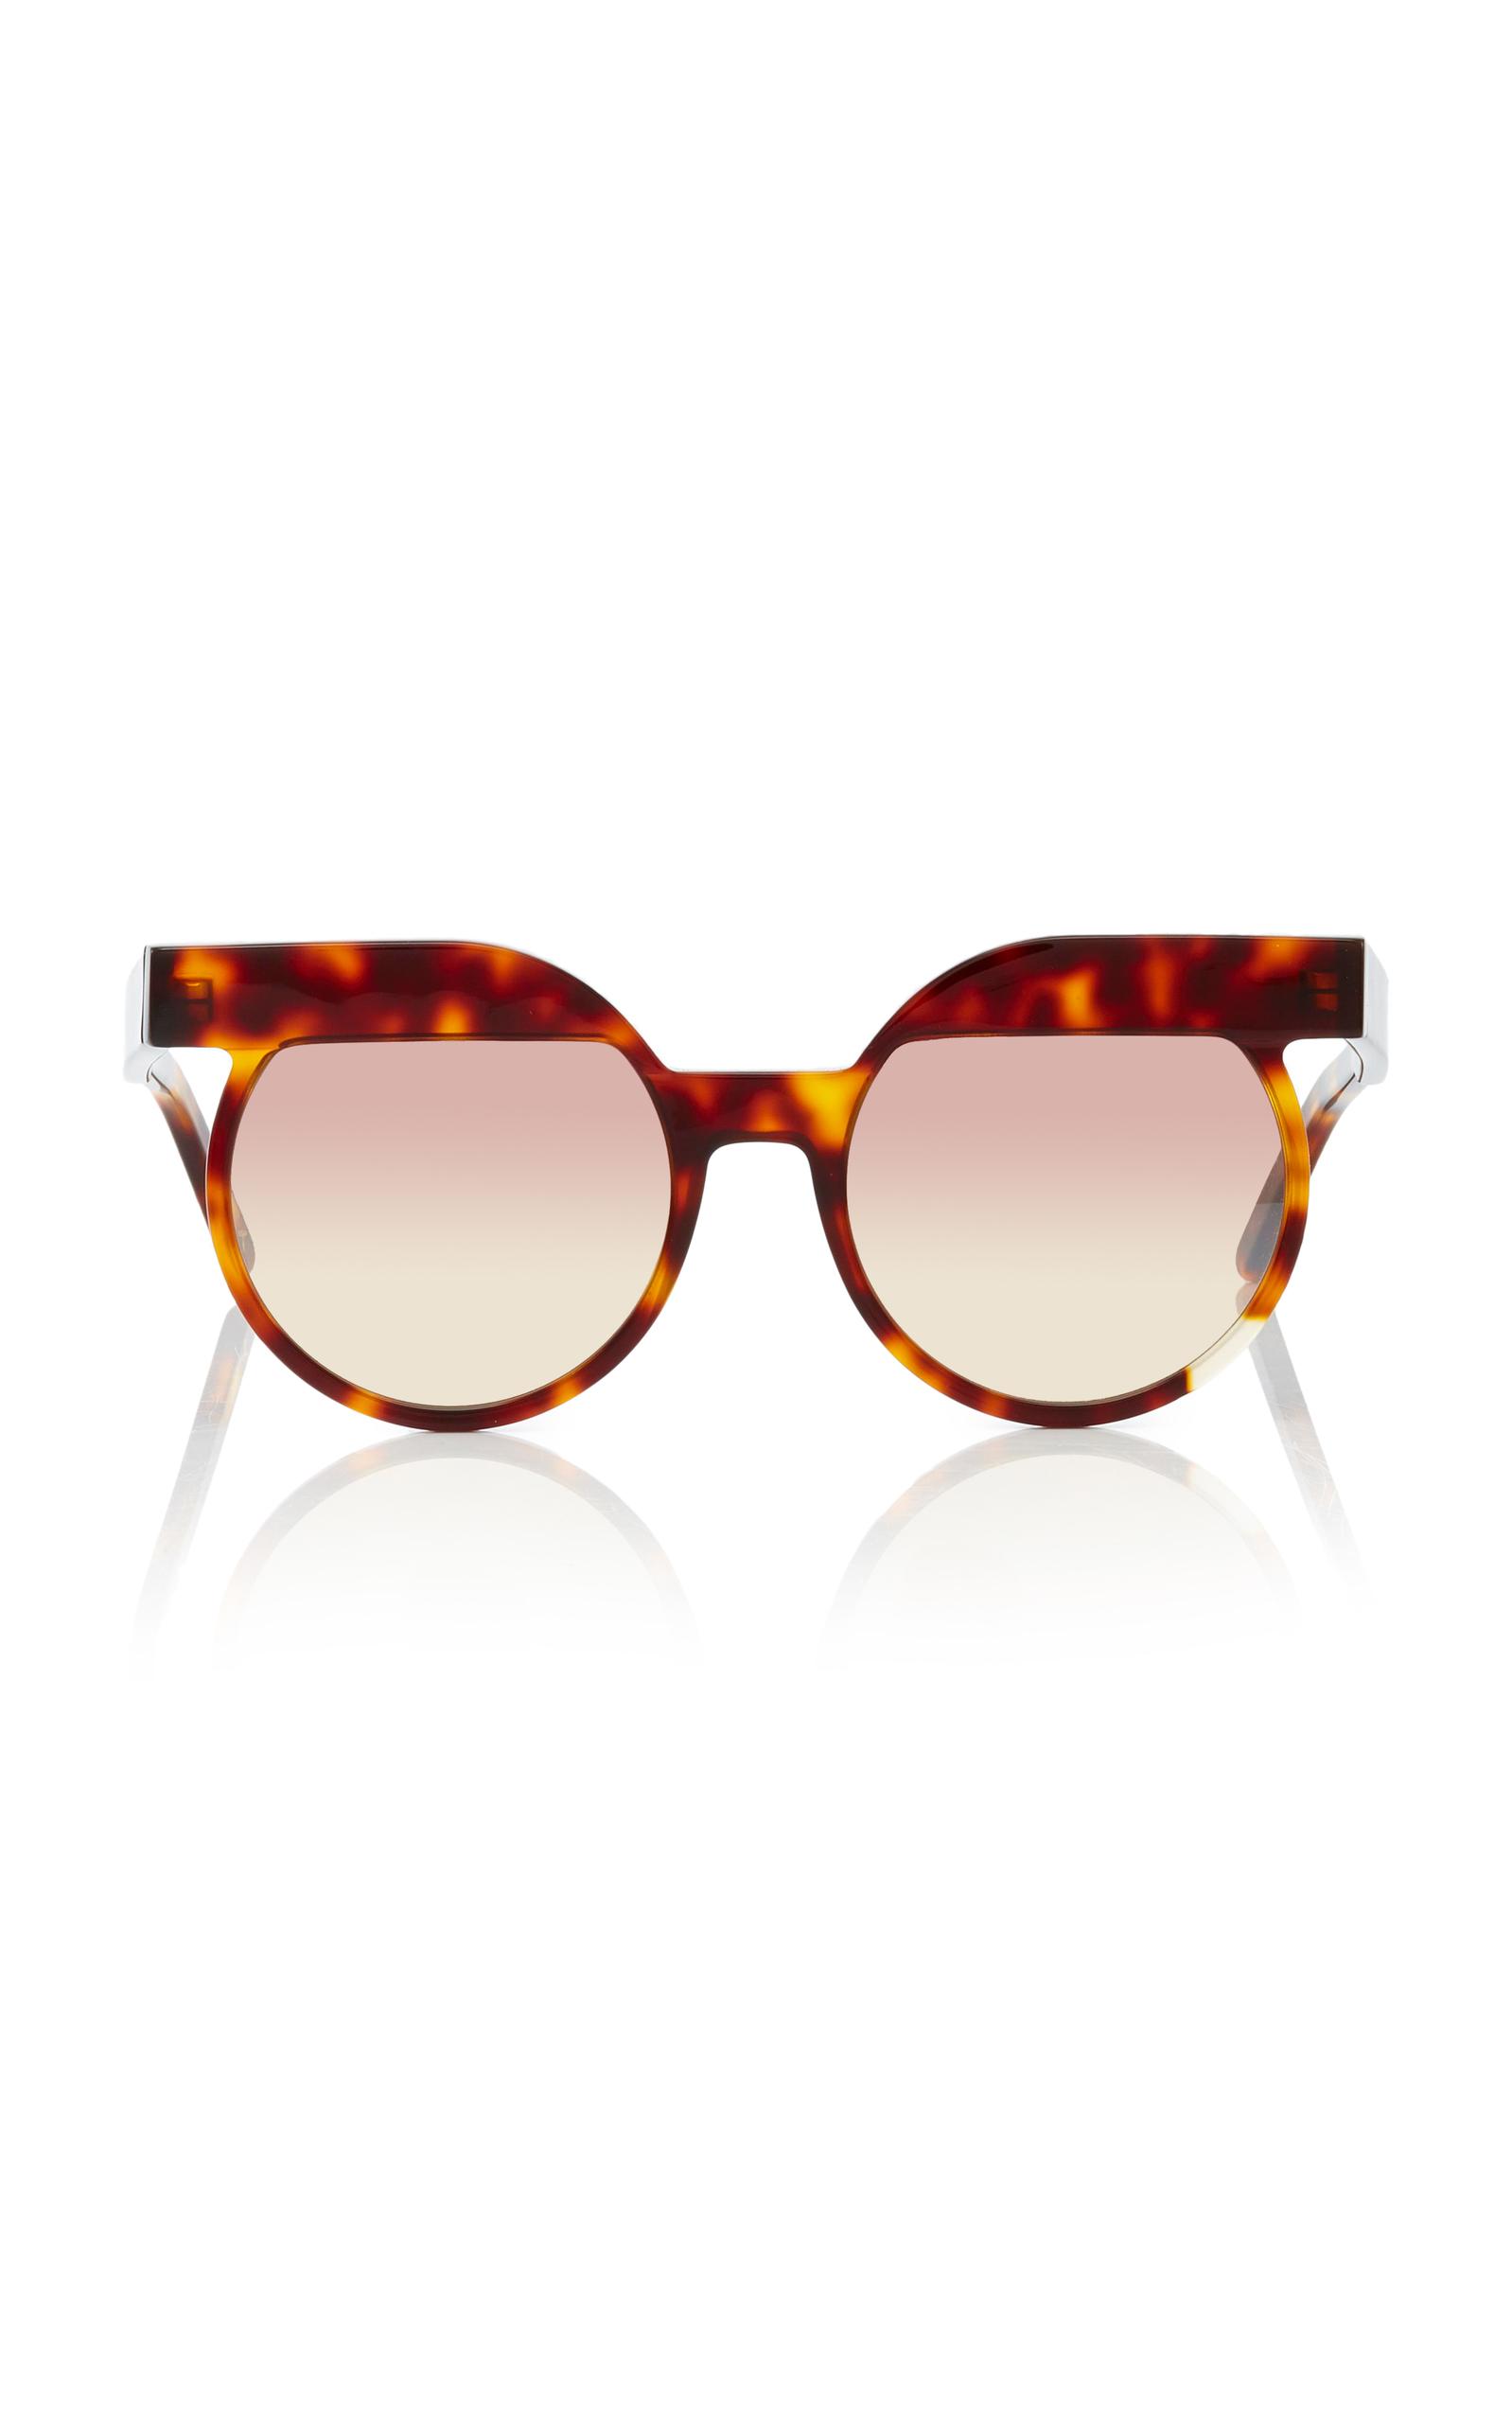 5aaff71504b Classic Tortoiseshell Acetate Sunglasses by JPLUS